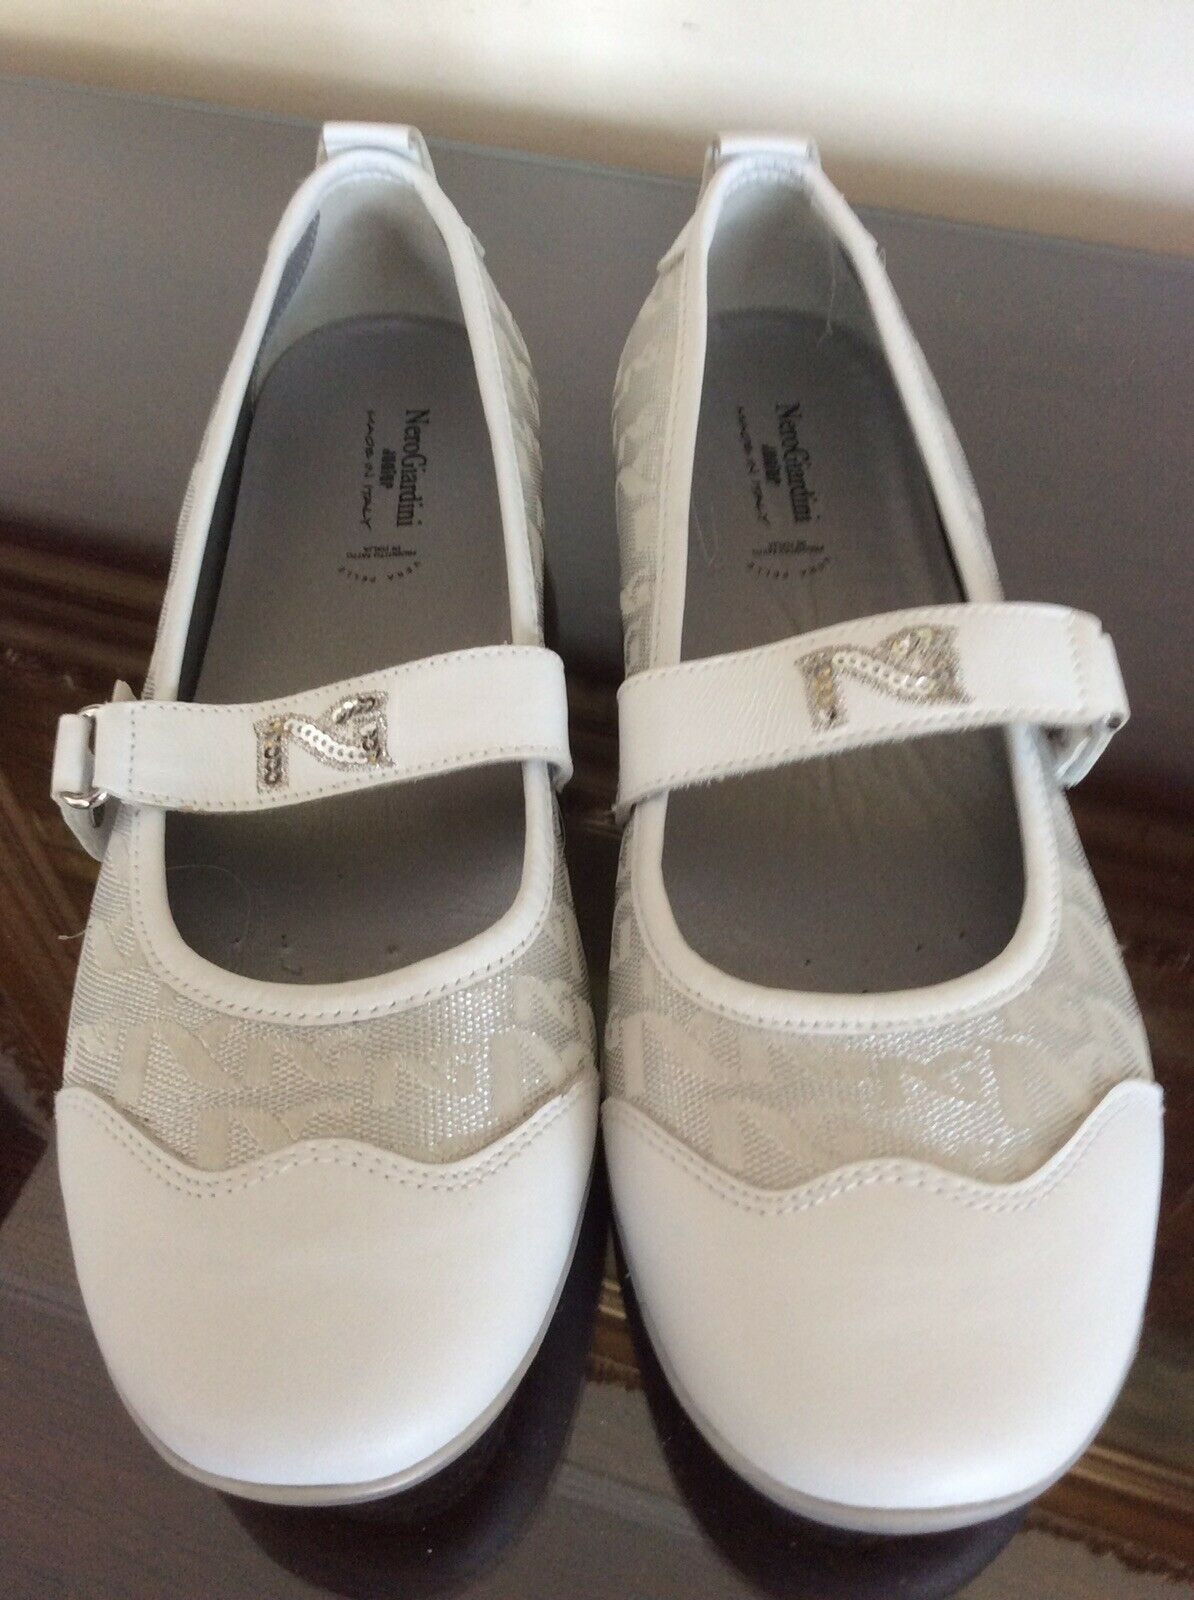 negro Giardini Junior Zapatos Planos Cuero Tela Italia blancoo Plateado Mujer Adolescente